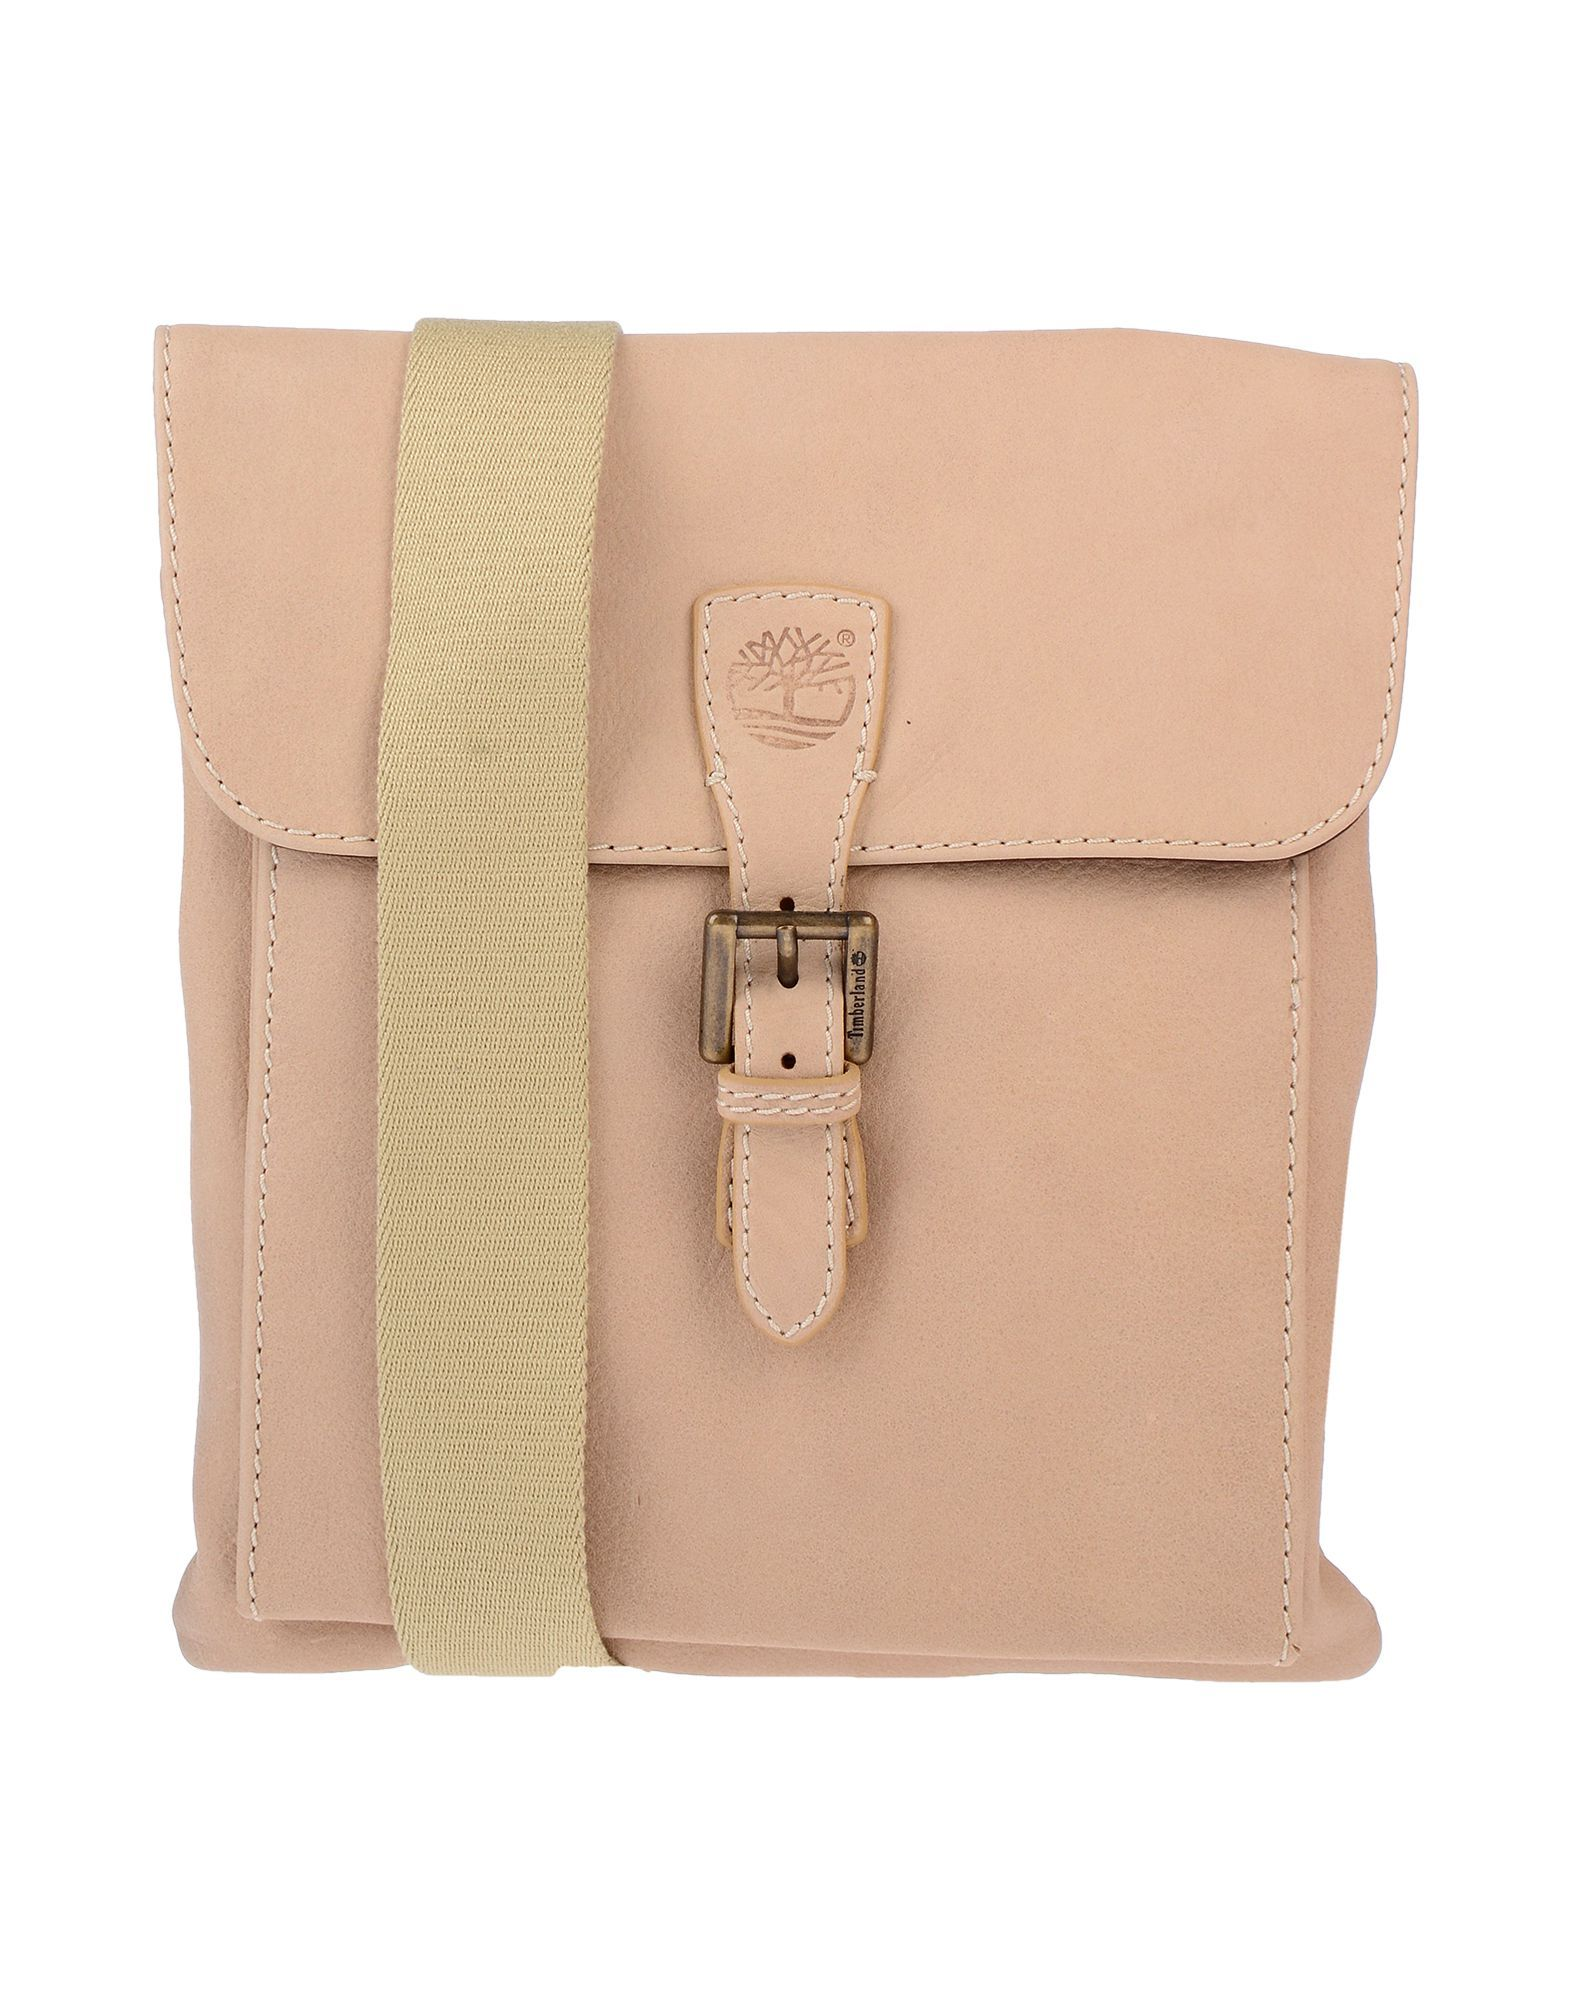 online store various styles a few days away TIMBERLAND HANDBAGS. #timberland #bags #shoulder bags ...